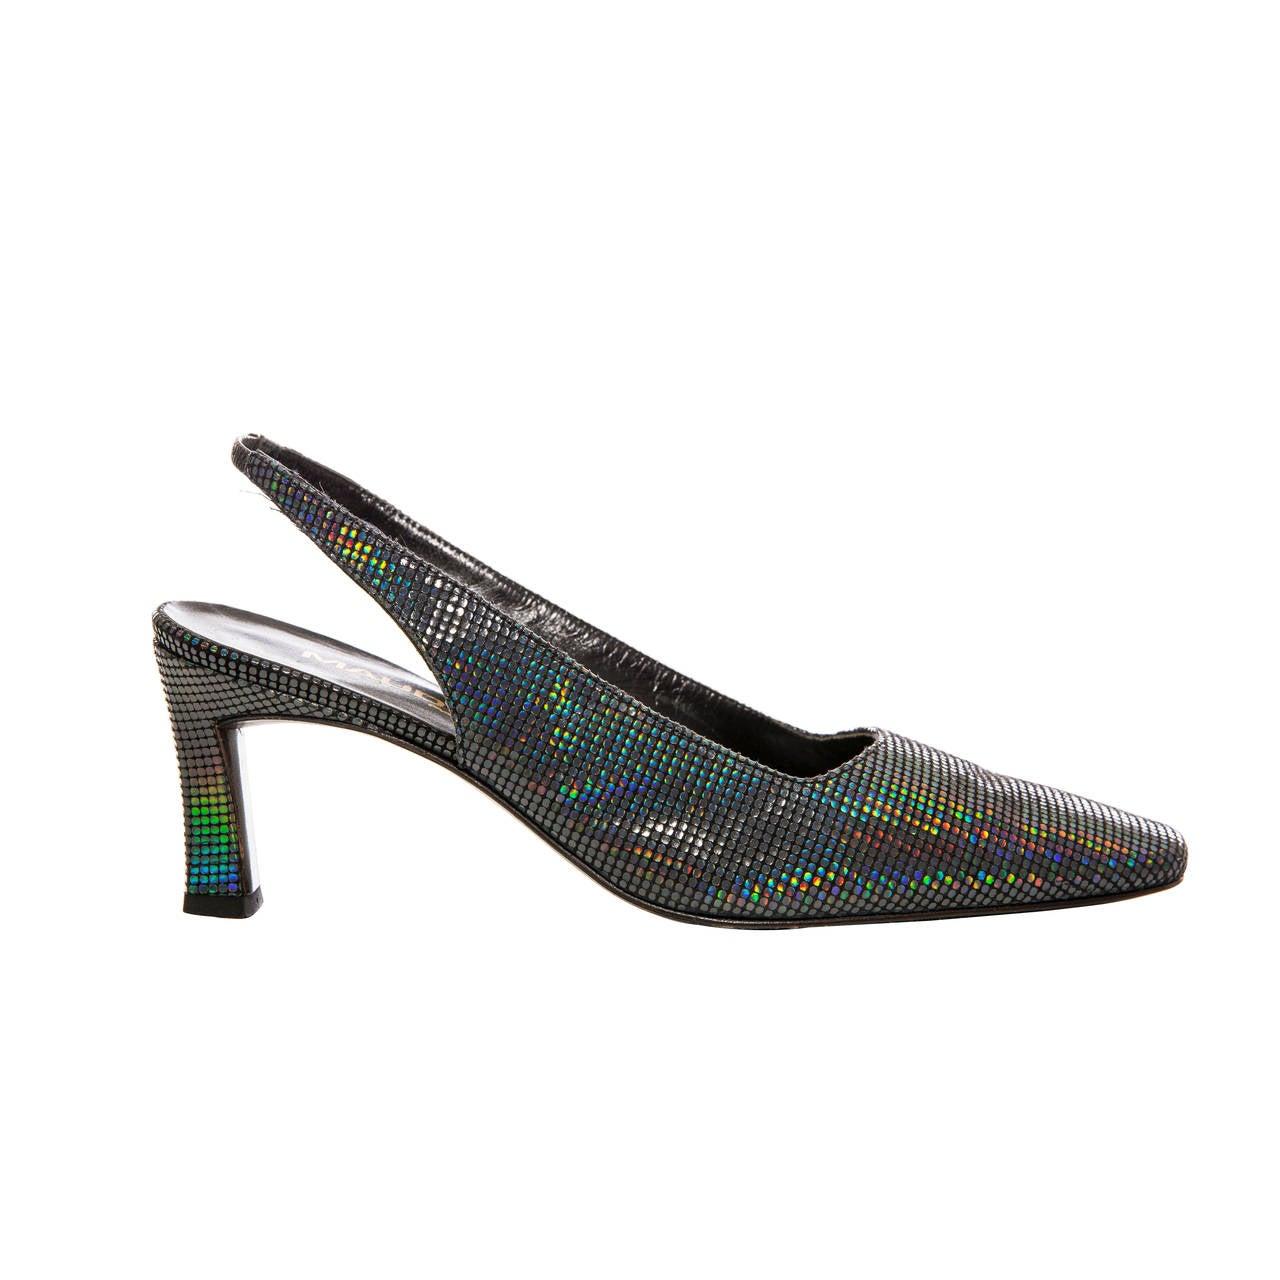 Maud Frizon Navy Blue Iridescent Suede Kitten Heel Shoe, Circa 1980's For Sale